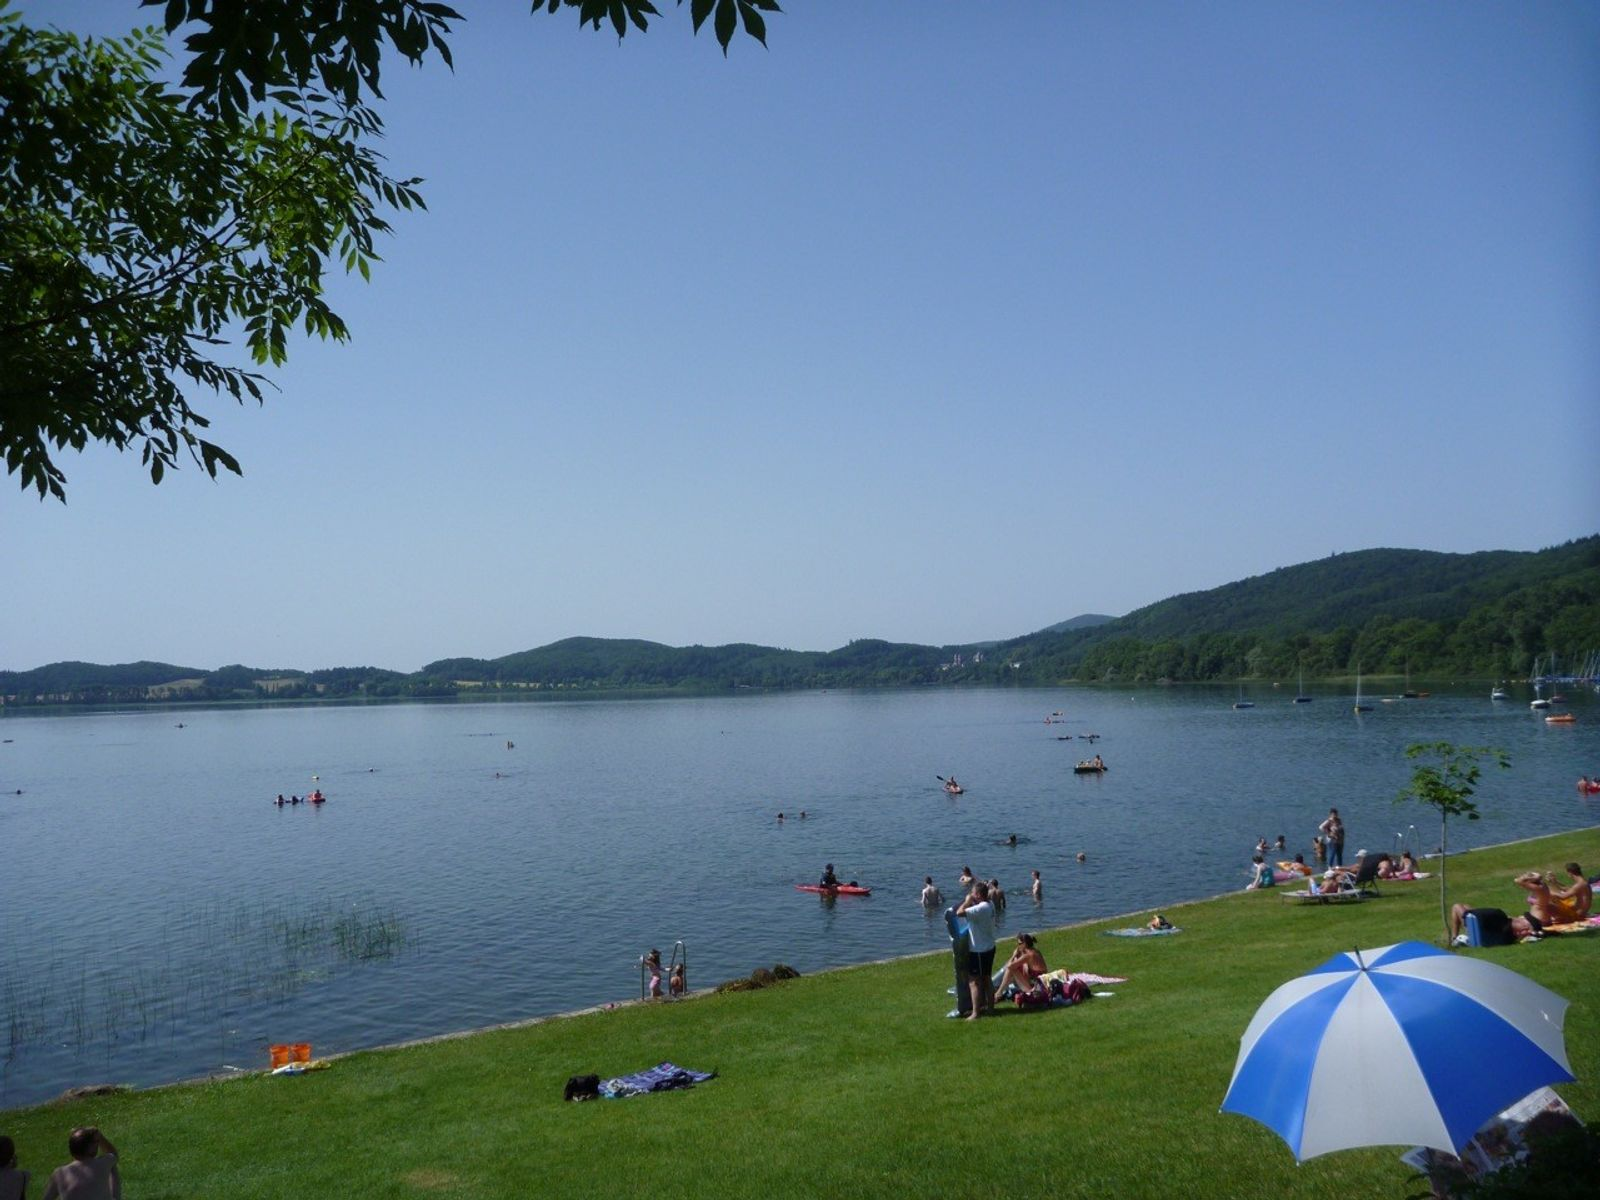 Camping Laacher See (Sonntag, 28.06.2020)